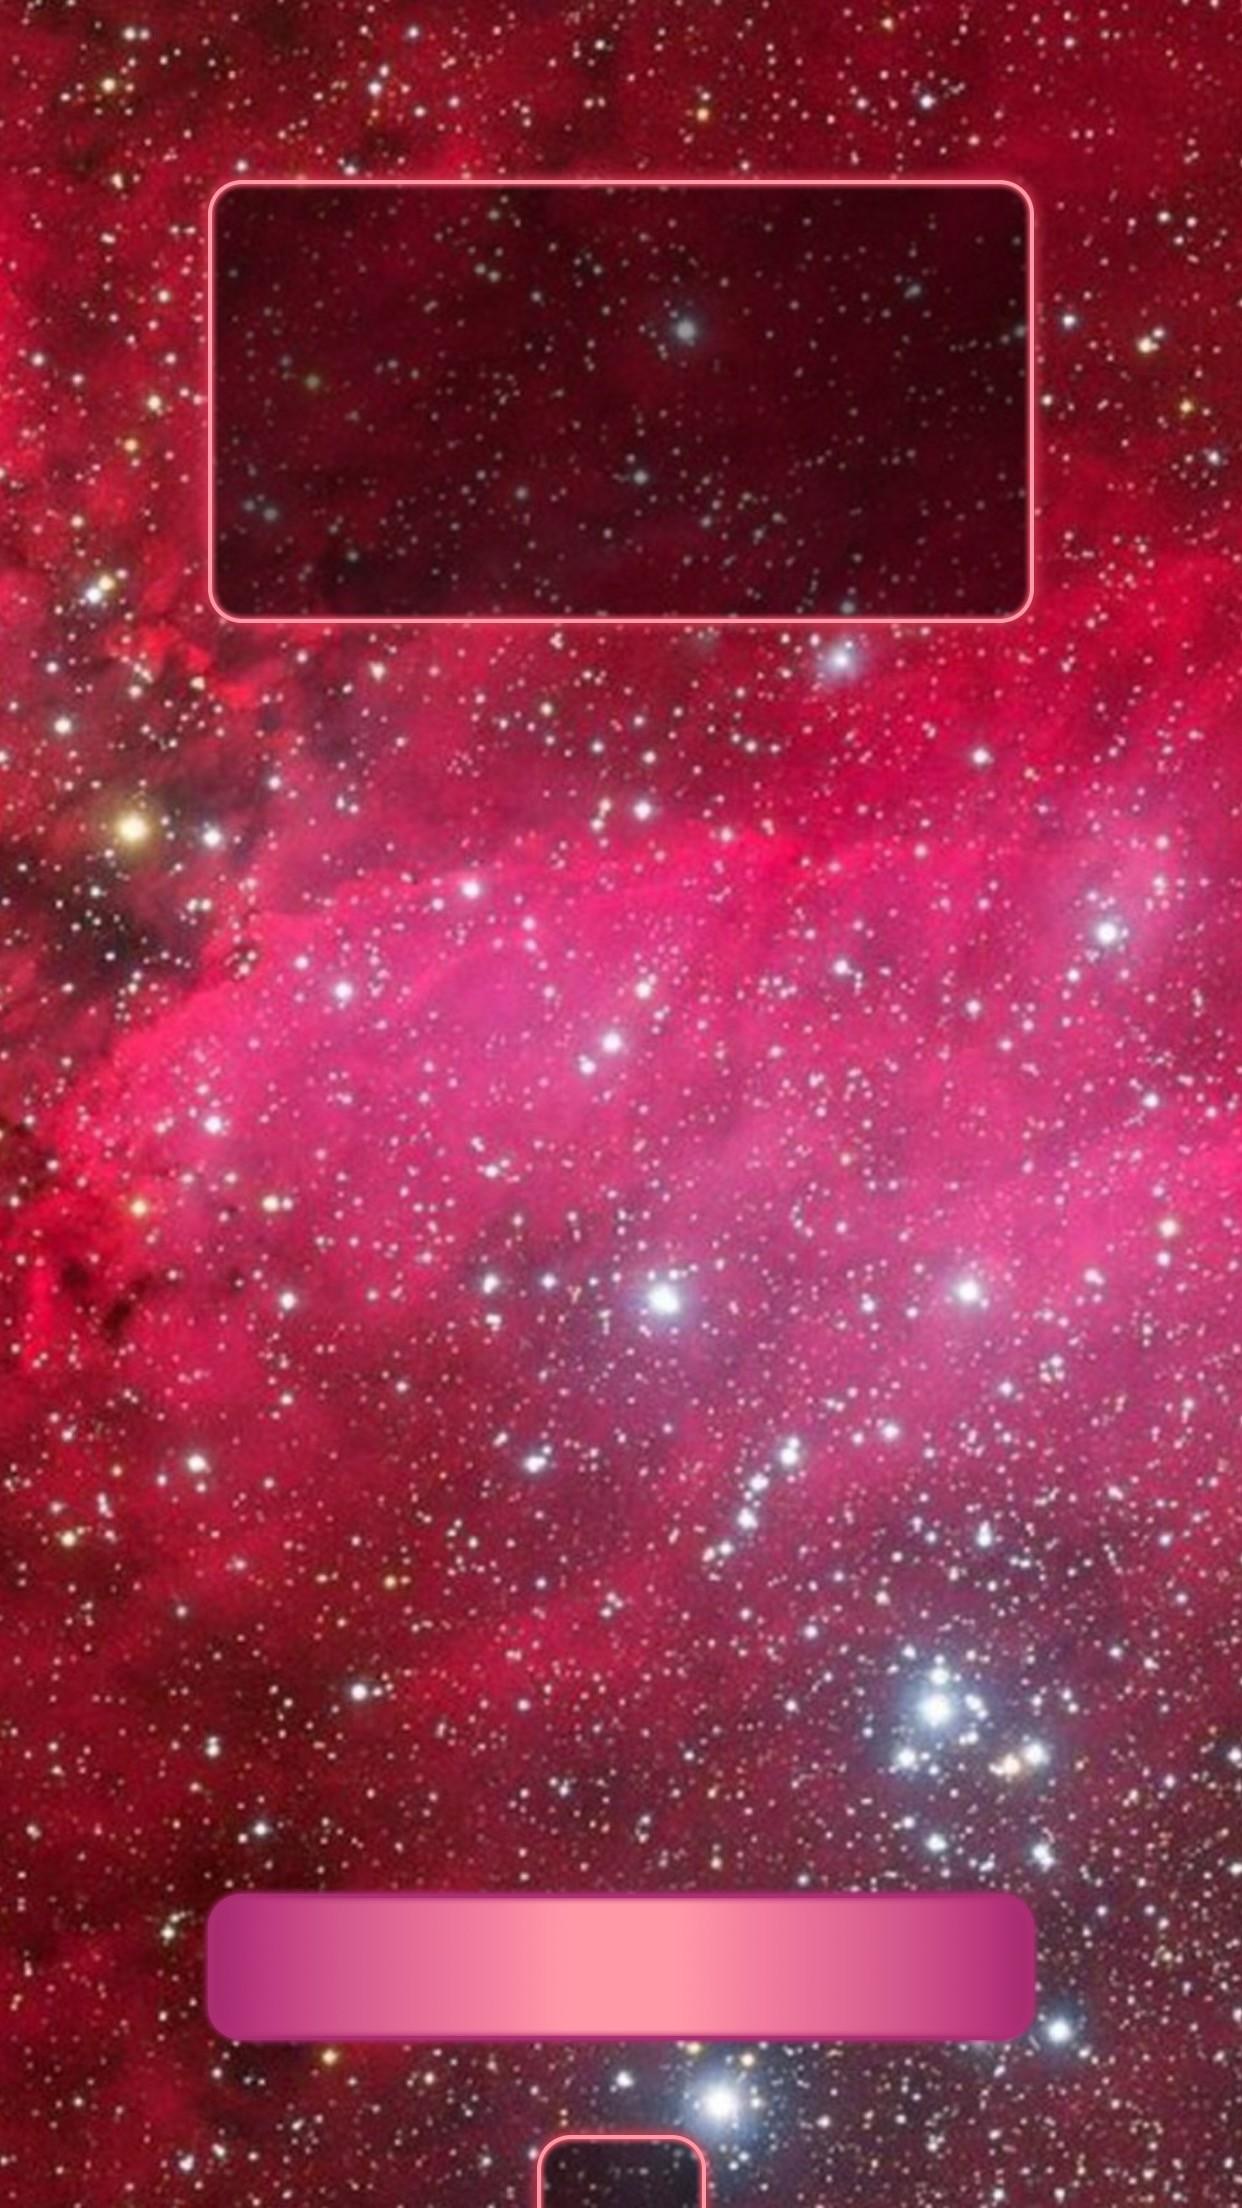 1242x2208 Dark Pink And Silver Glittery Lockscreen